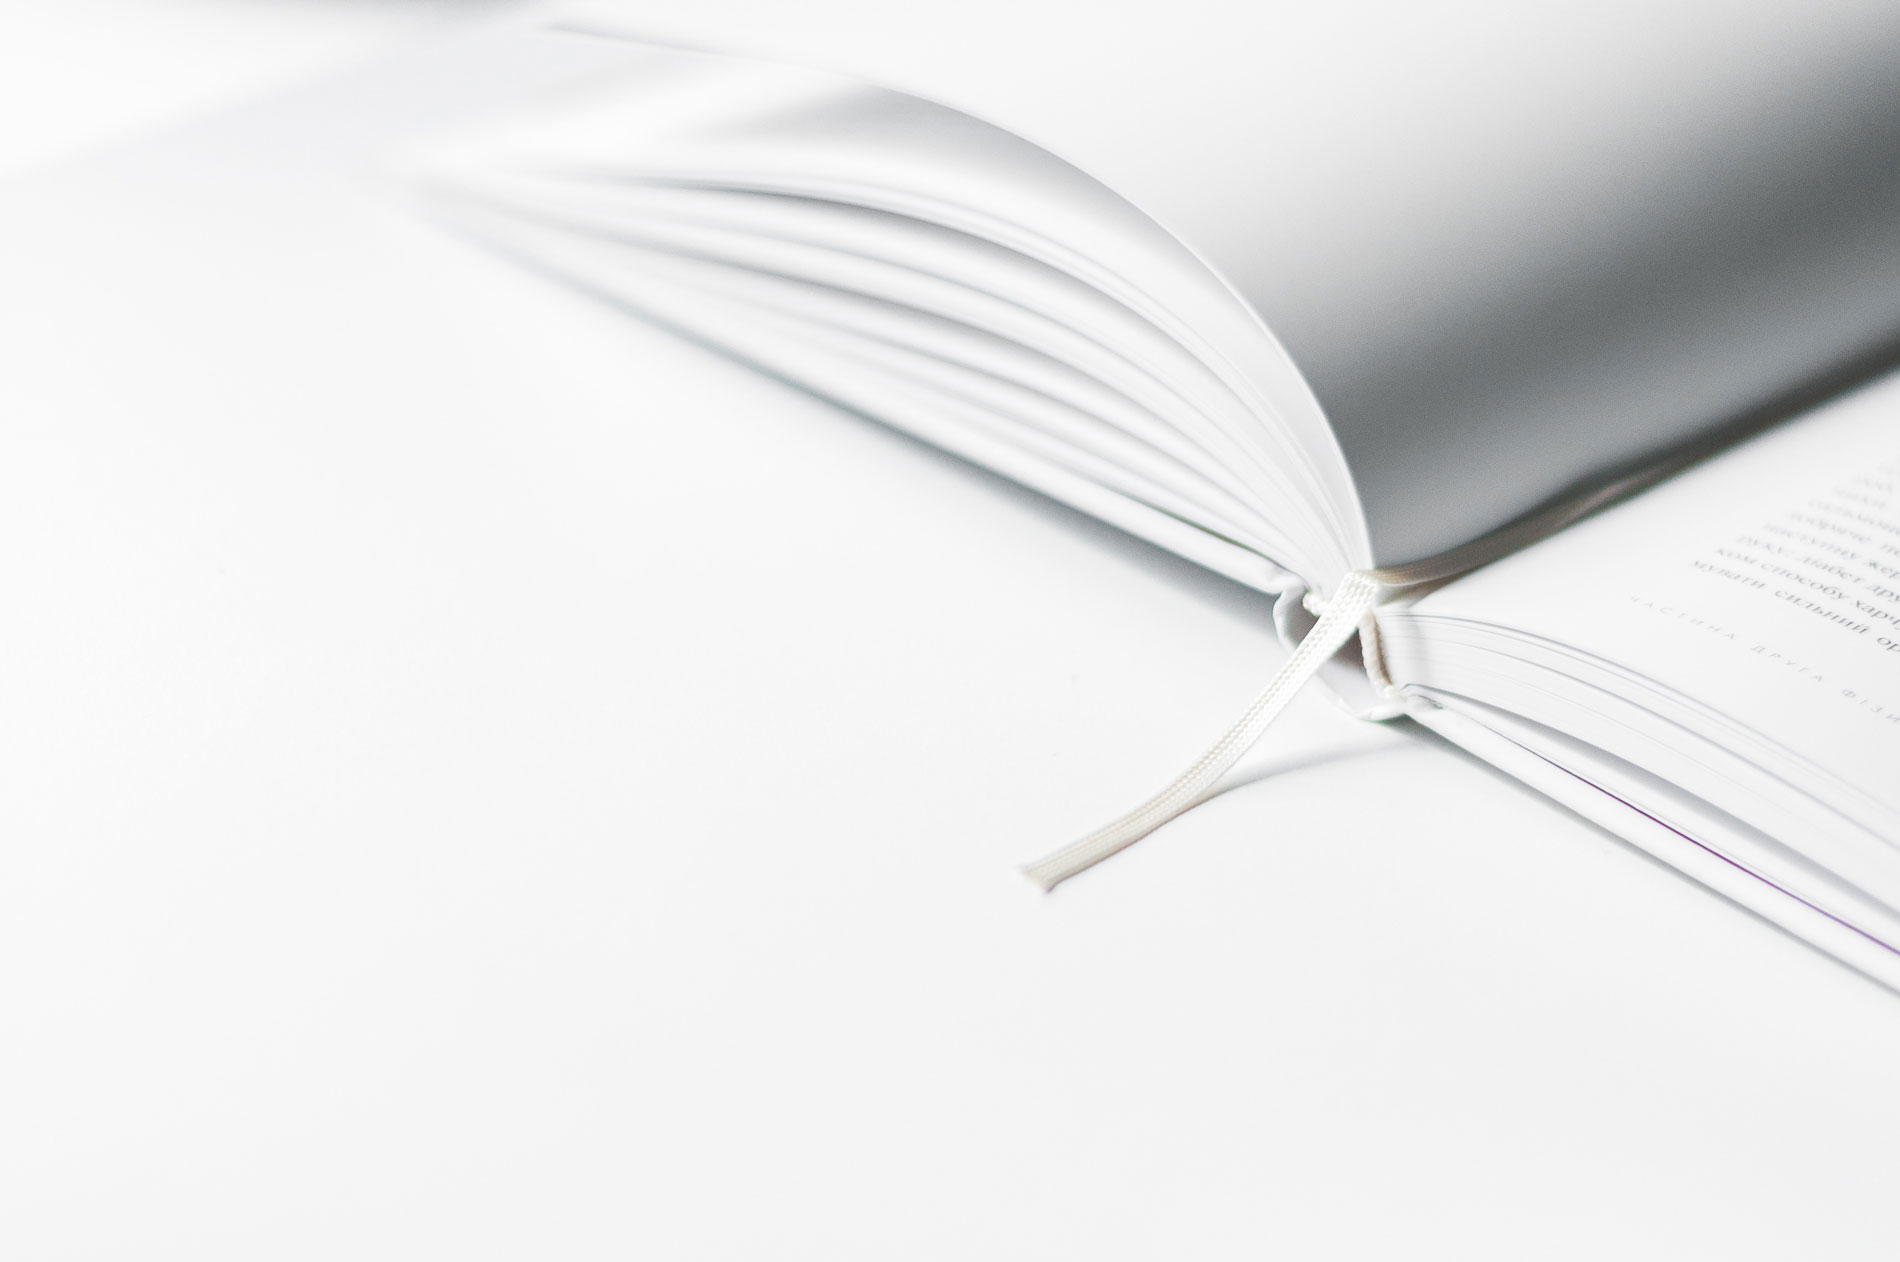 Libro - foto Olia Gozha